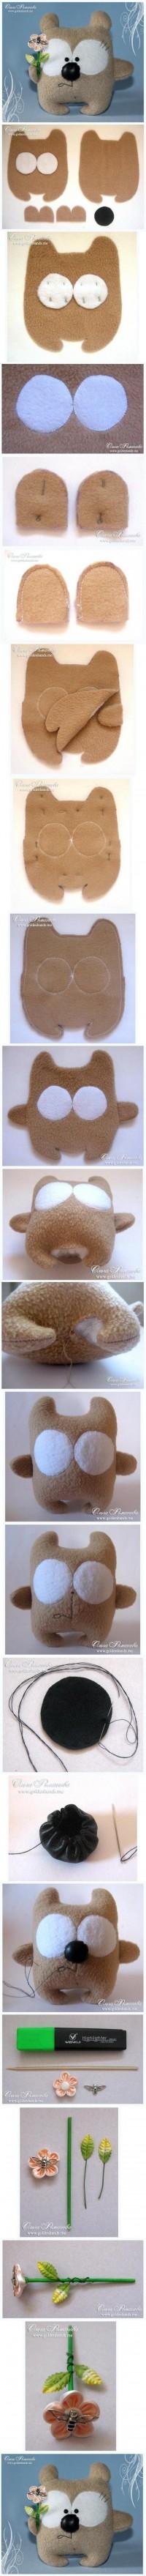 DIY Cute Little Fabric Bear DIY Projects | UsefulDIY.com